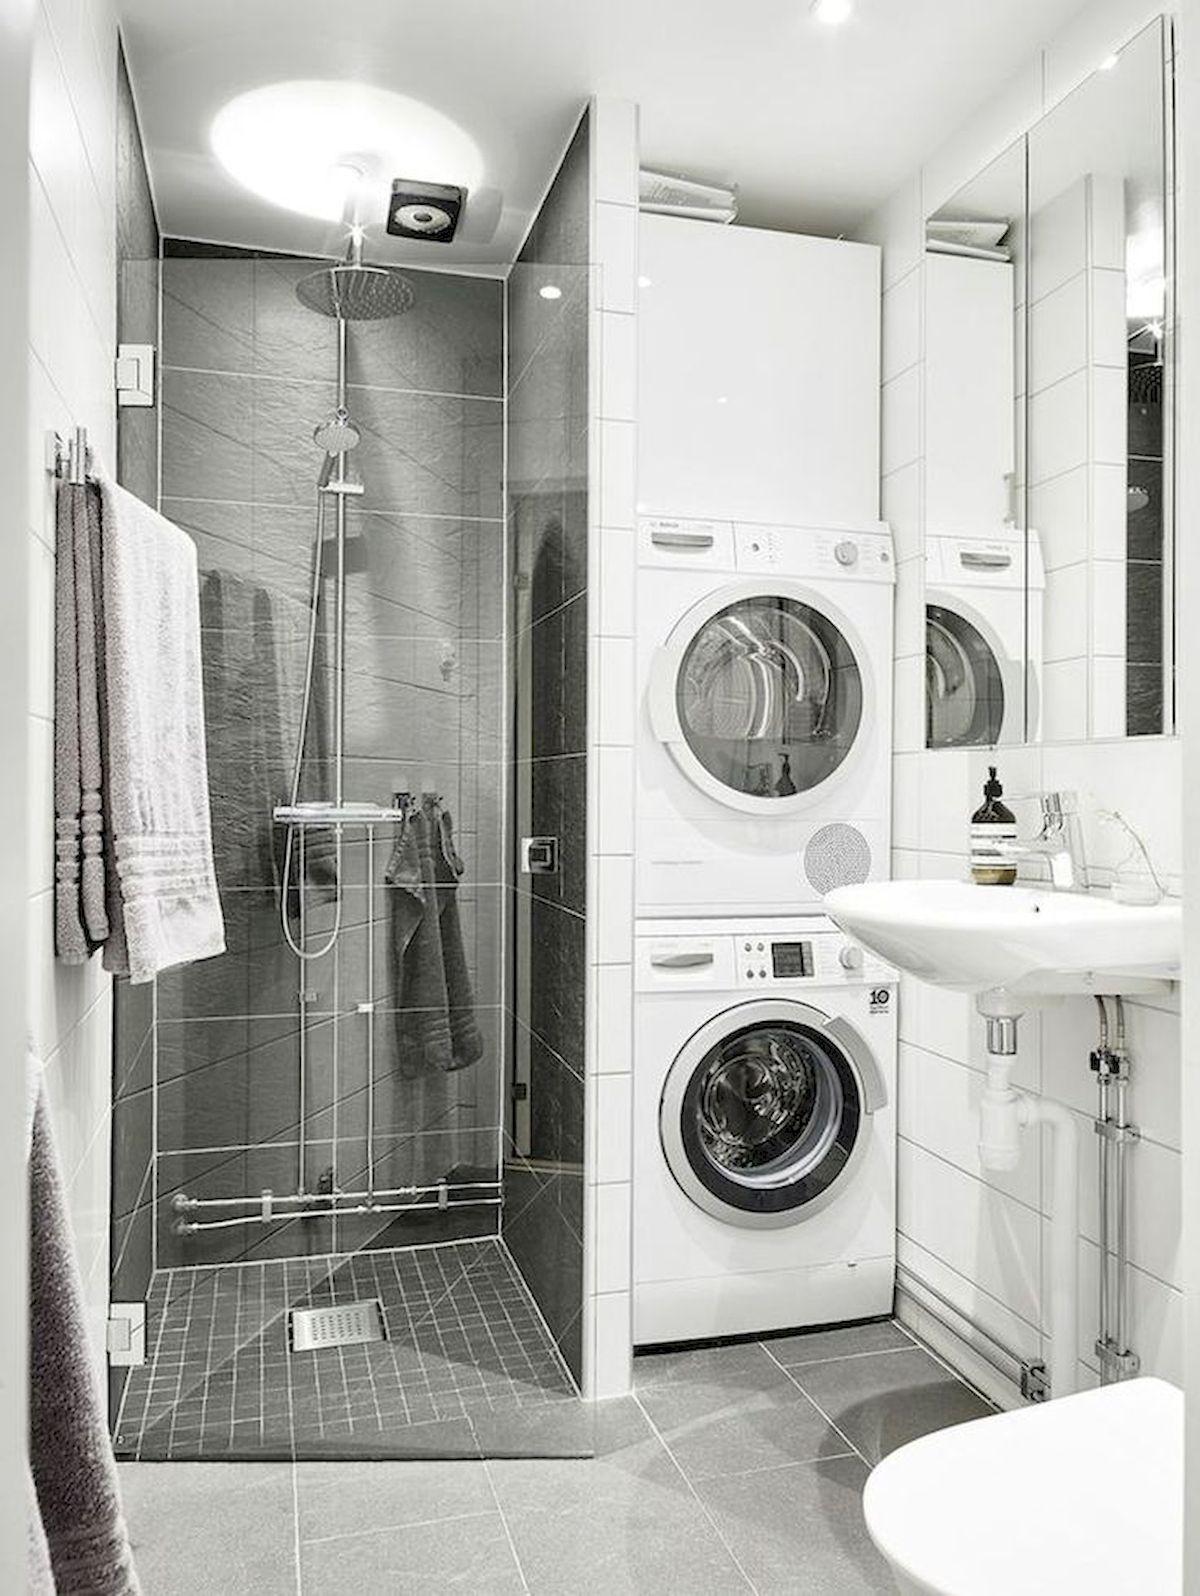 Nice 40 Stunning Tiny House Bathroom Shower Design Ideas And Remodel Https Livingmarch Com 40 Stunn Laundry In Bathroom Bathroom Shower Design Small Bathroom